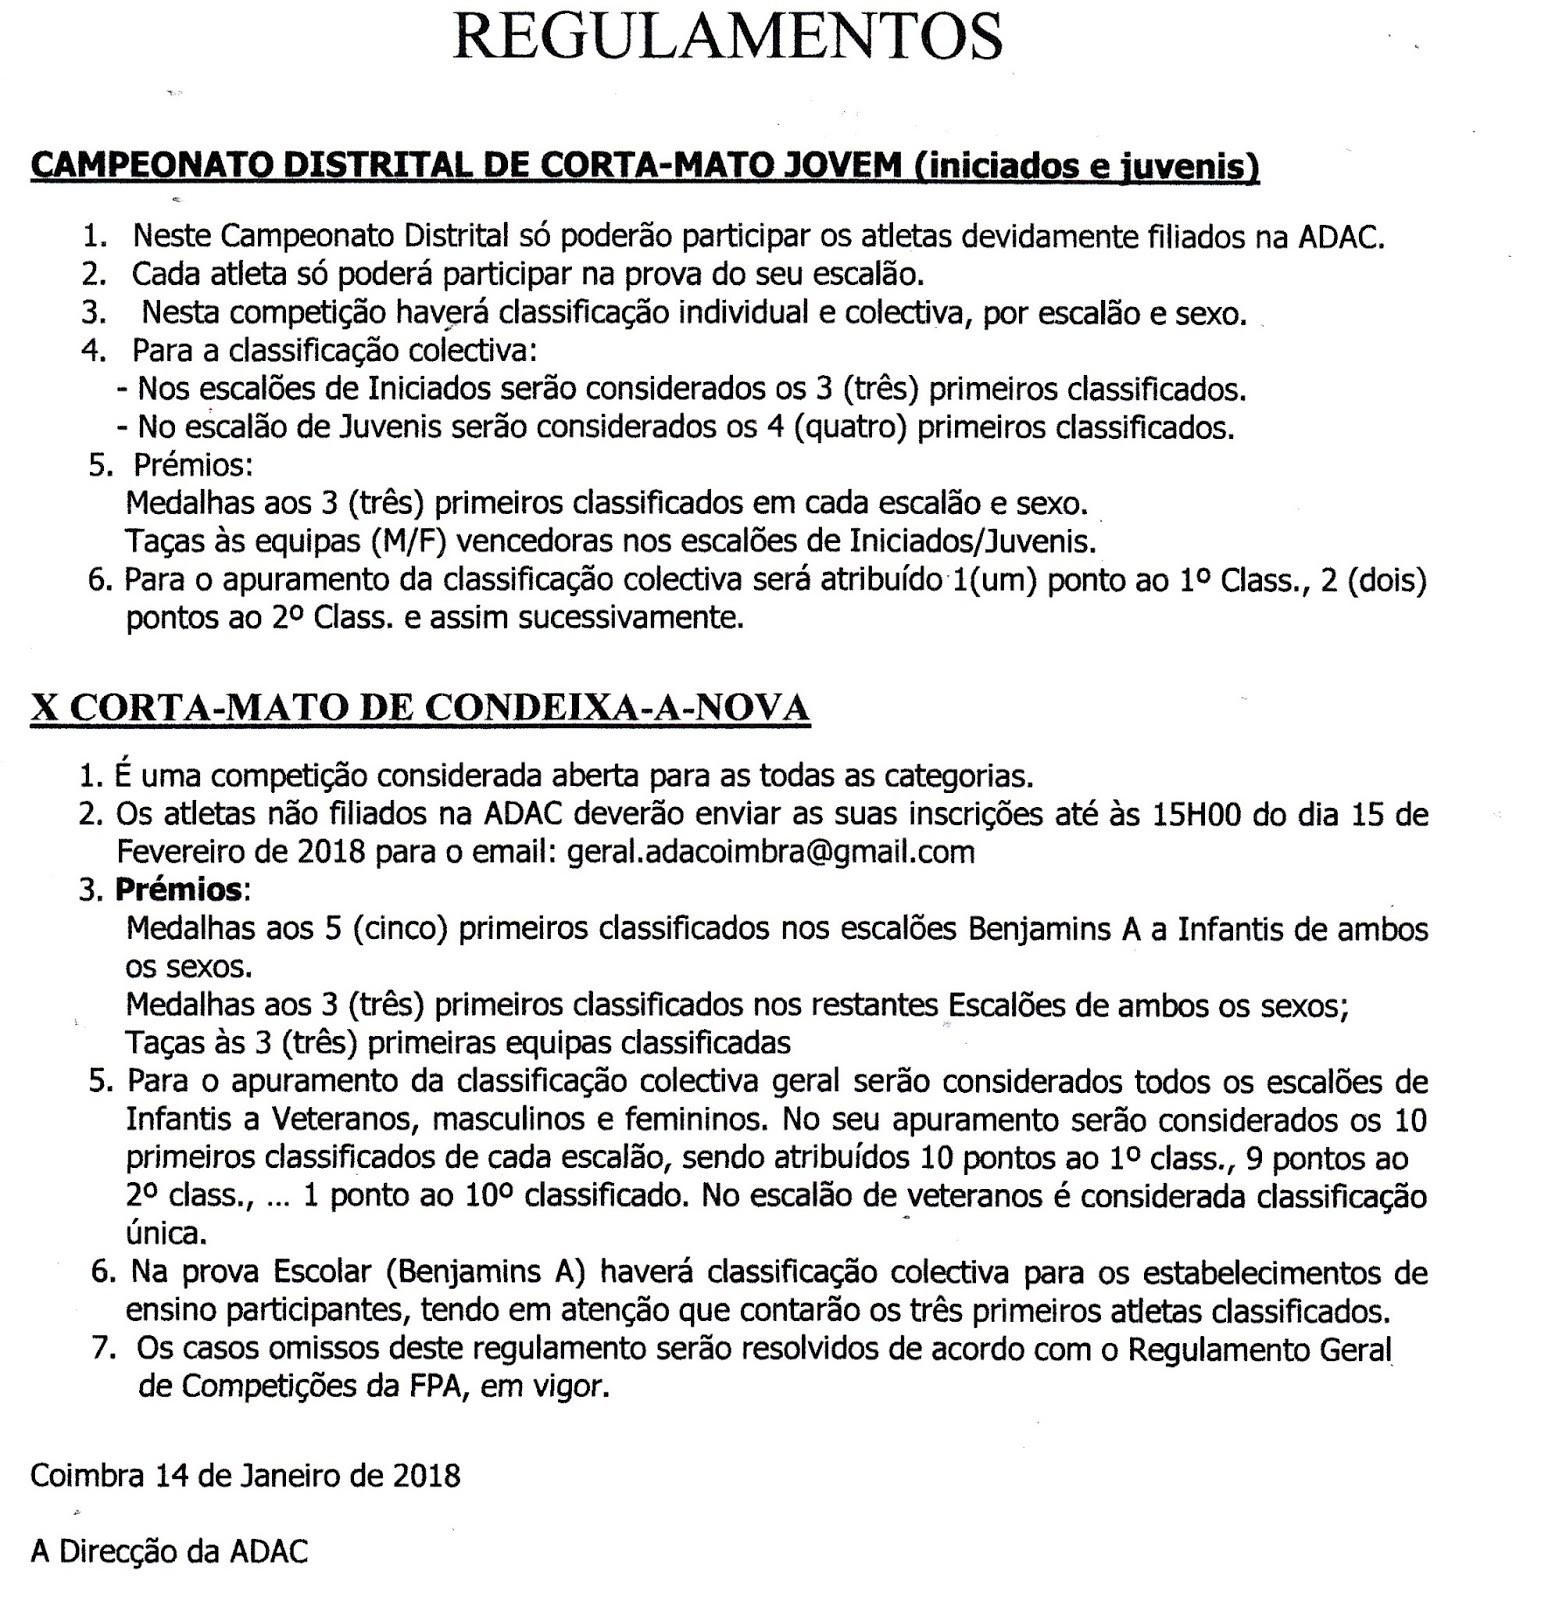 Calendario Mensal 2019 Portugal Mejores Y Más Novedosos Cluve Clube De Veteranos De atletismo De Coimbra Janeiro 2018